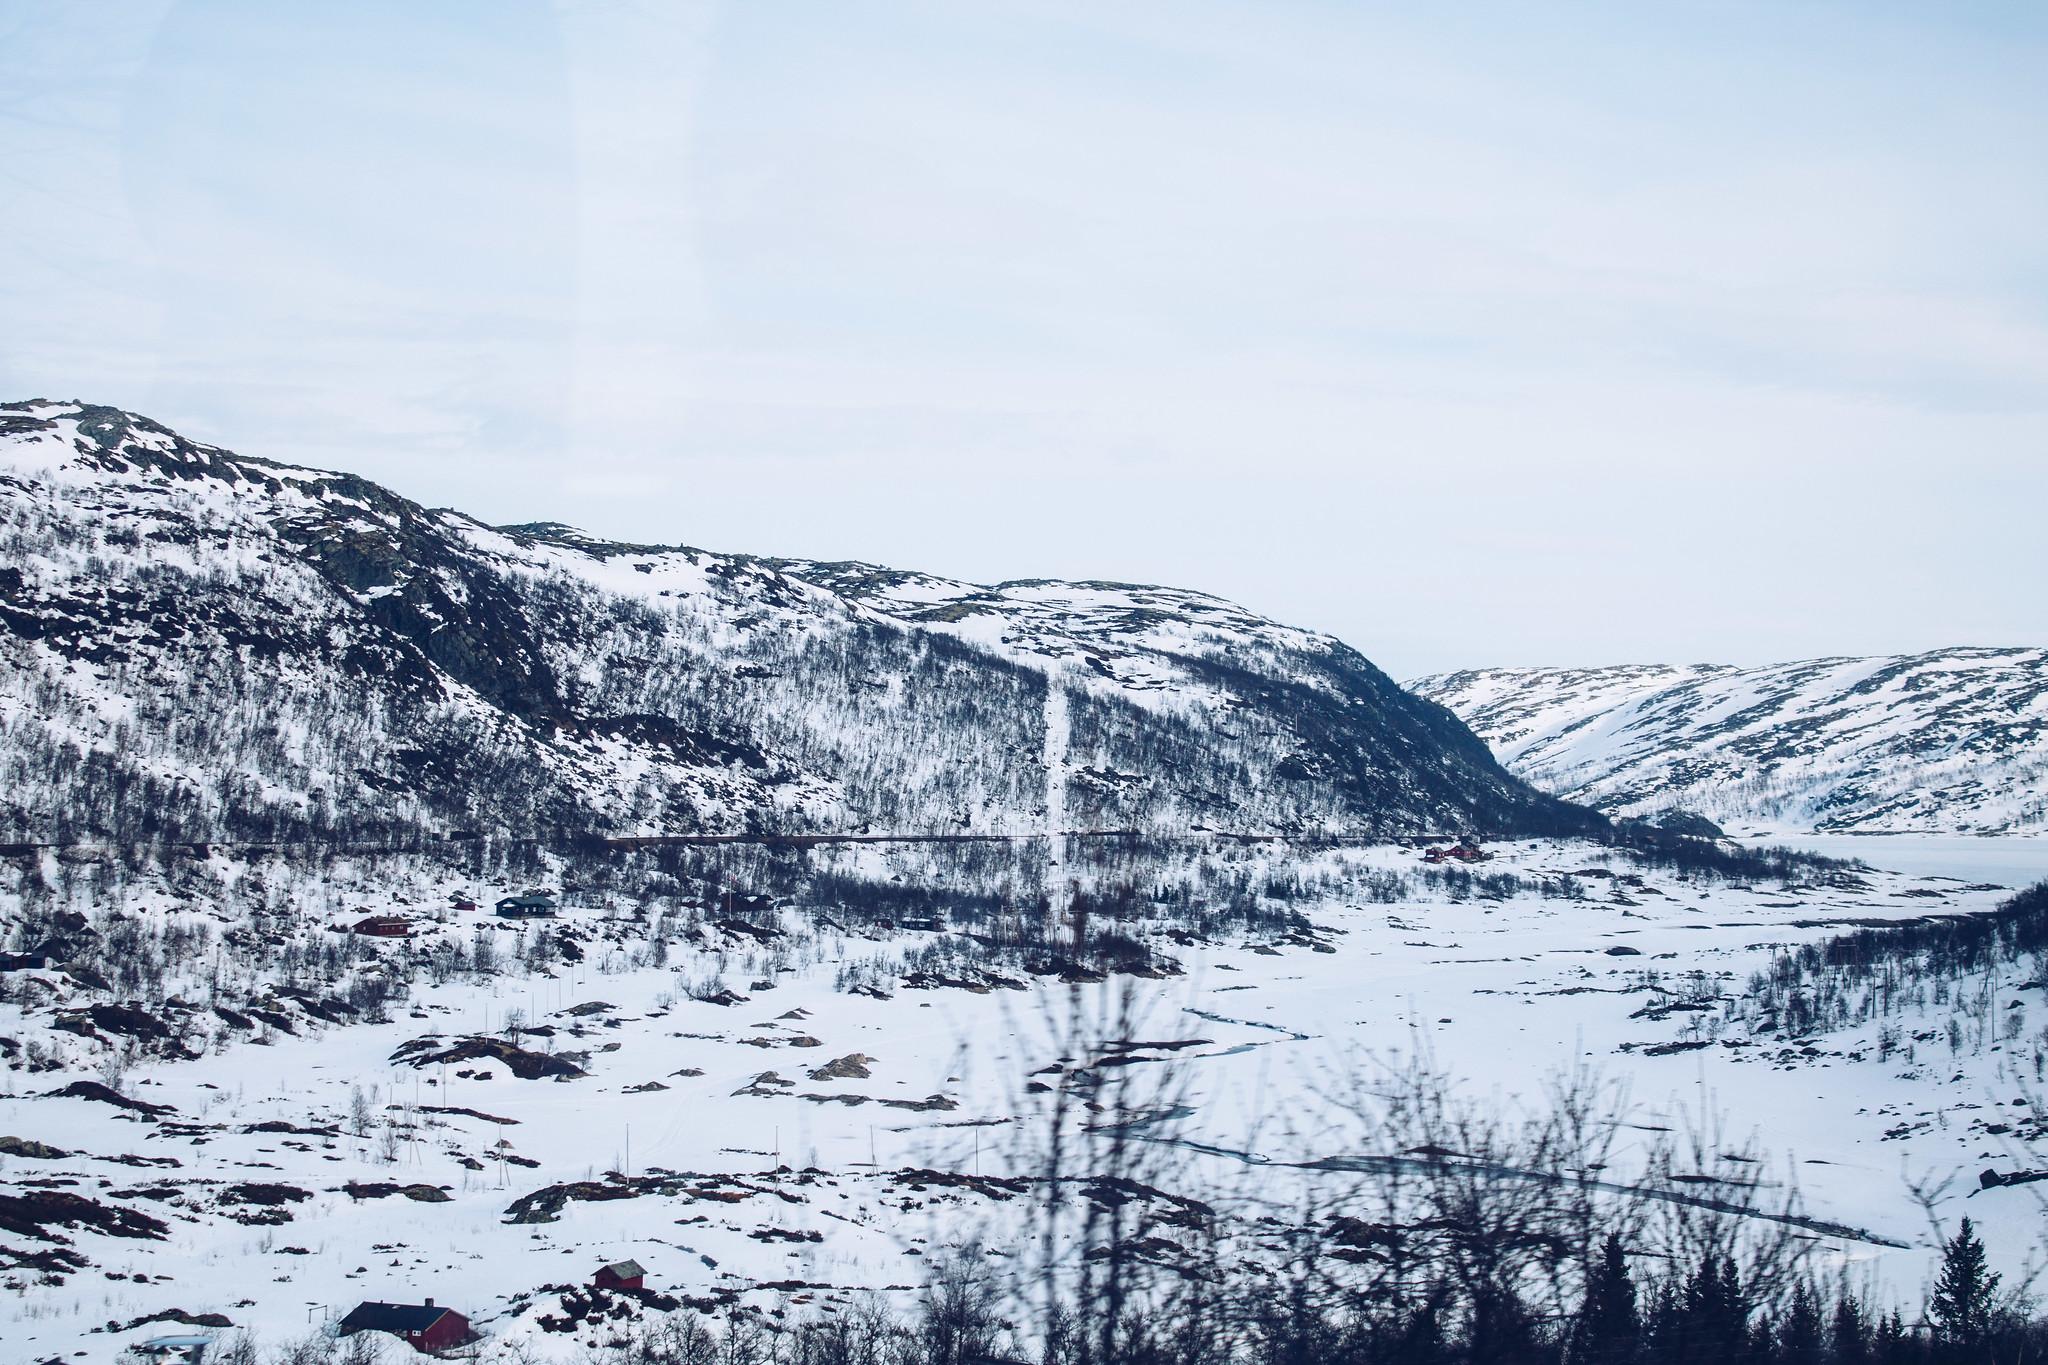 Norway in a nutshell - Myrdal till Oslo tåg - reaktionista.se